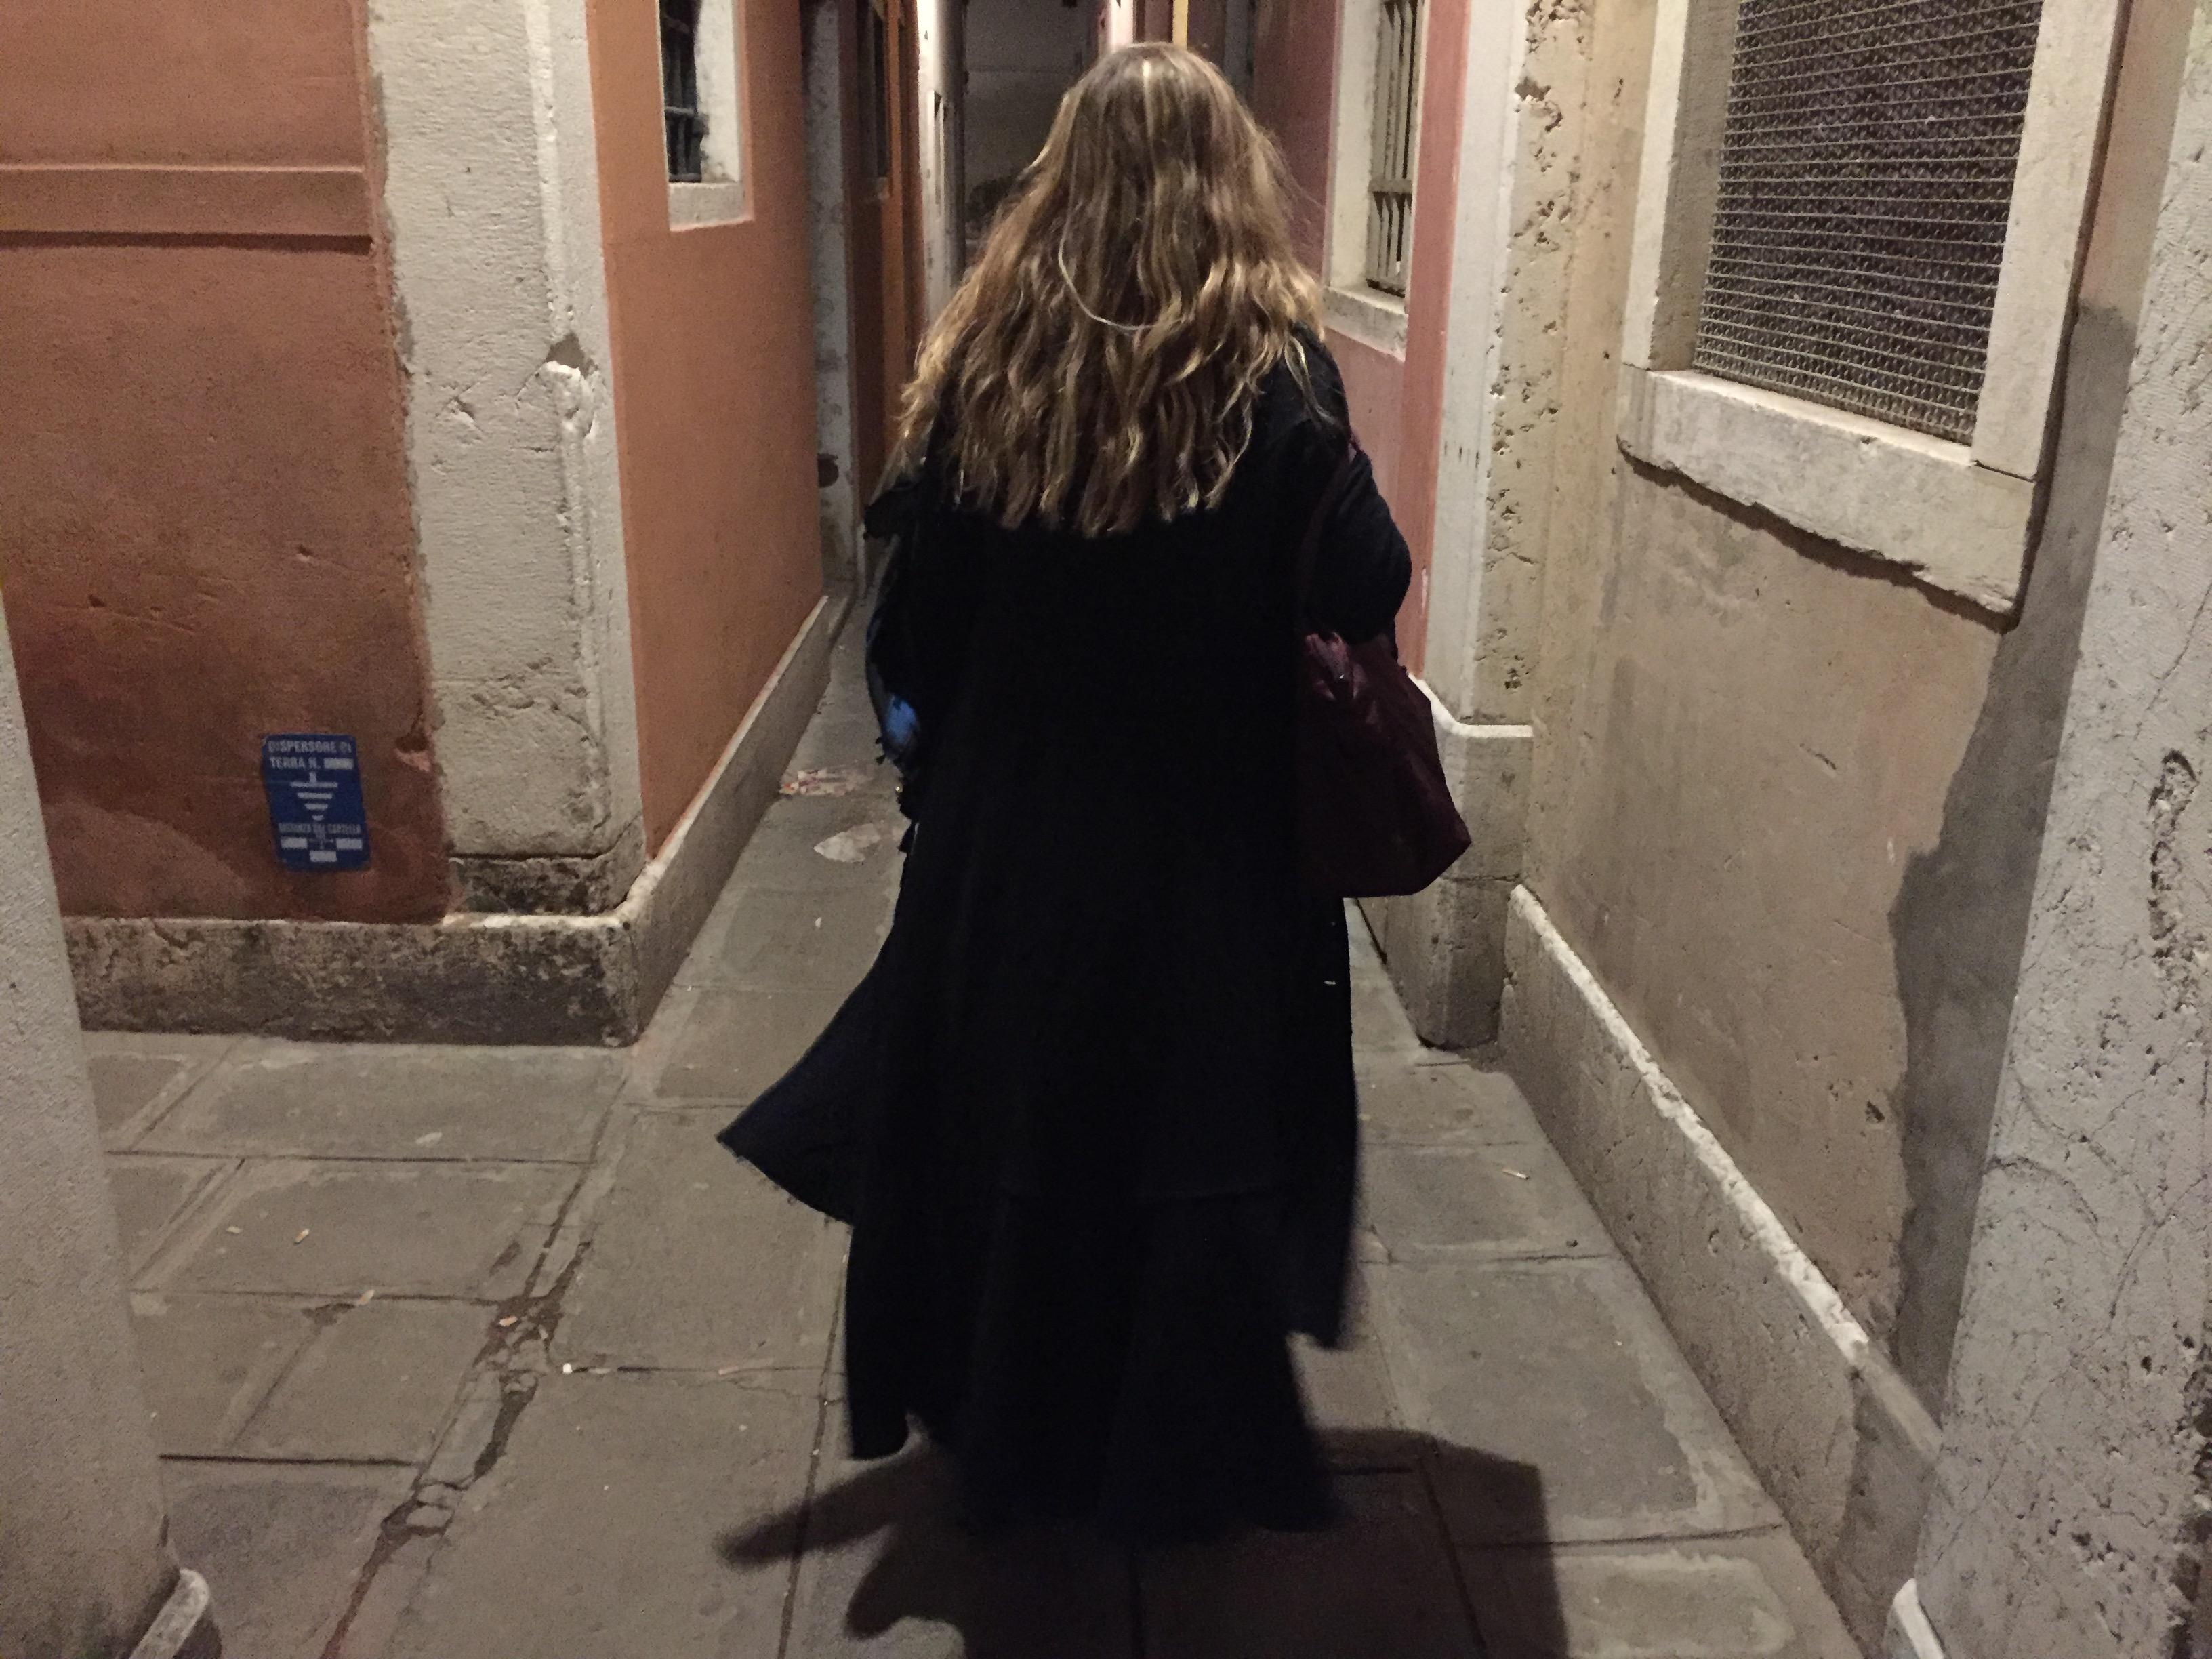 Sometimes good surprises wait in dark alleys. Photo credit: M. Ciavardini